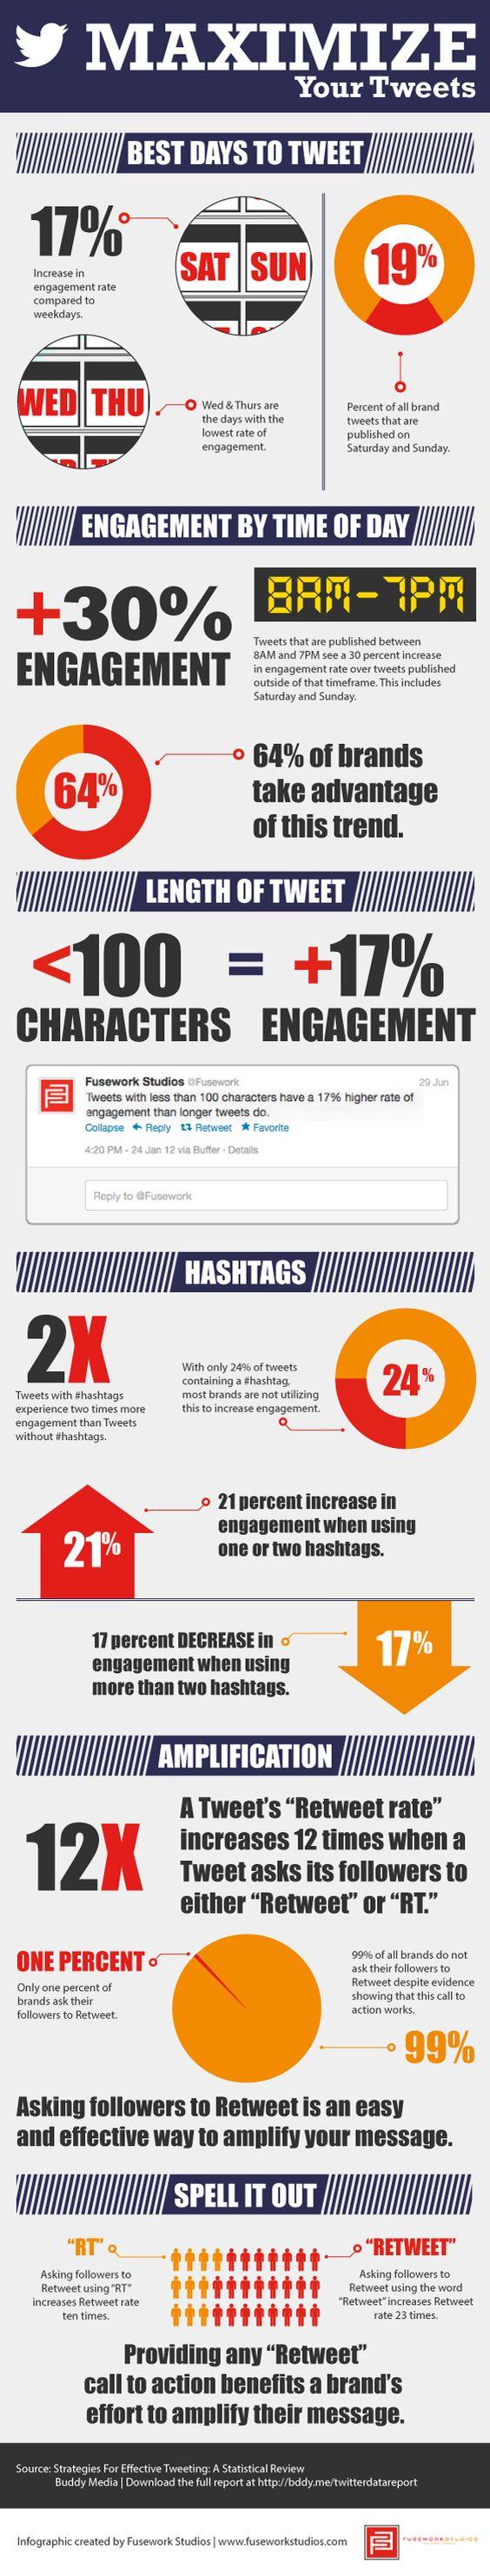 Best Days To Tweet. #socialmedia #twitter #infographic